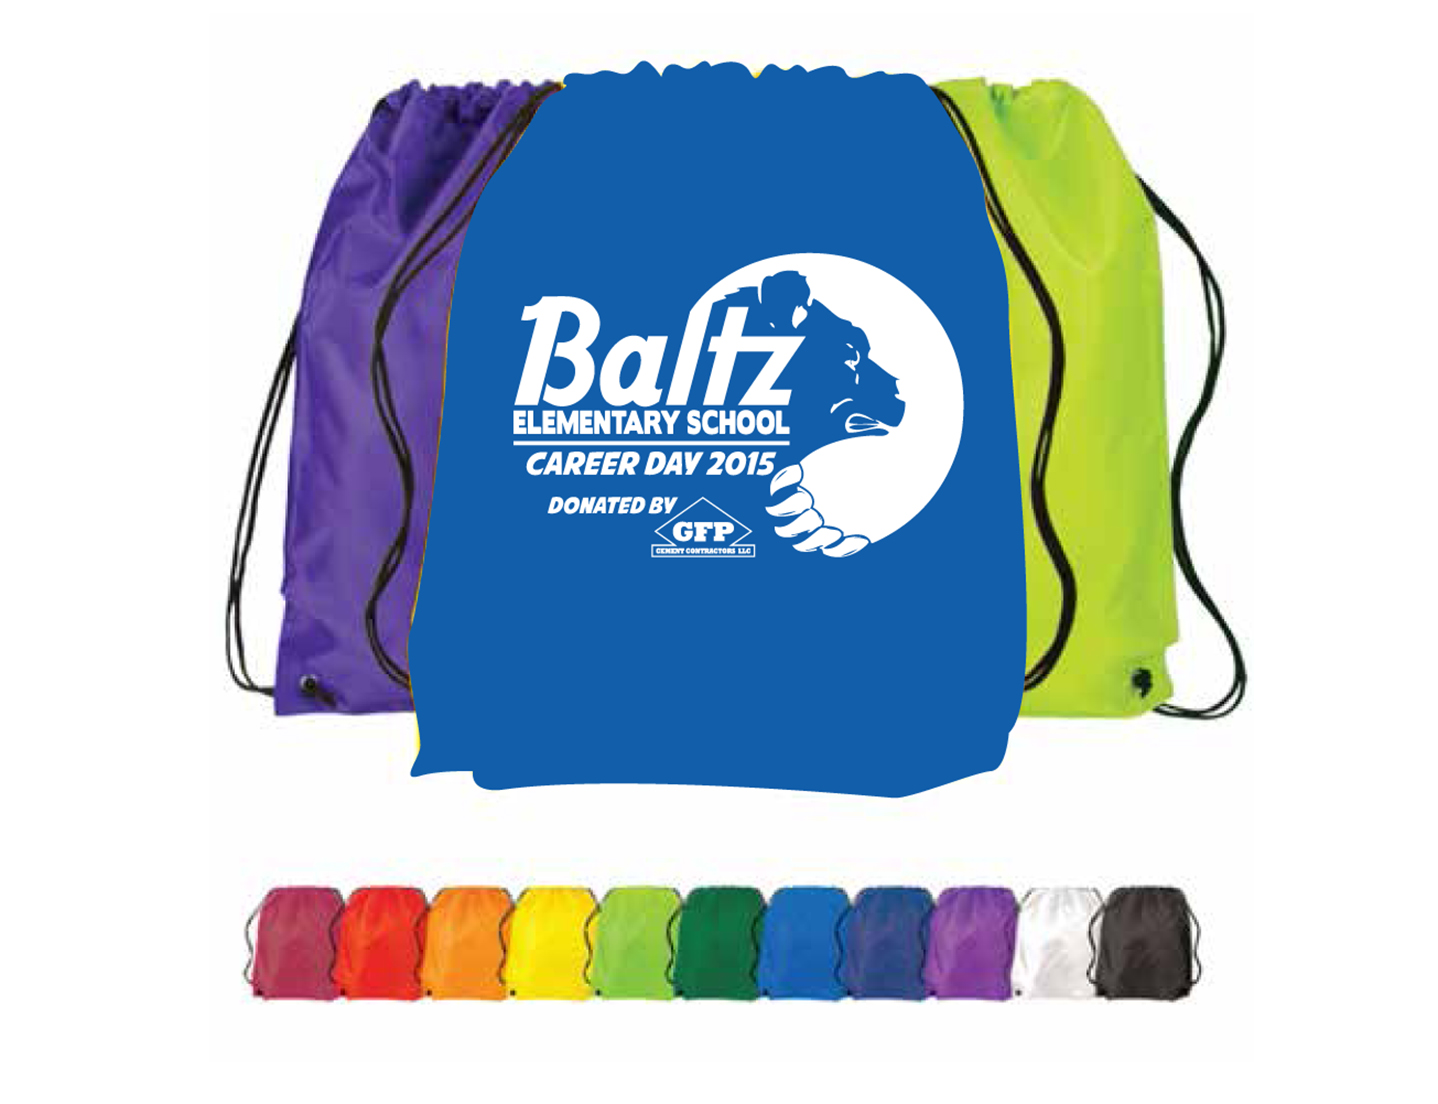 baltz elementary bags_thumb.jpg